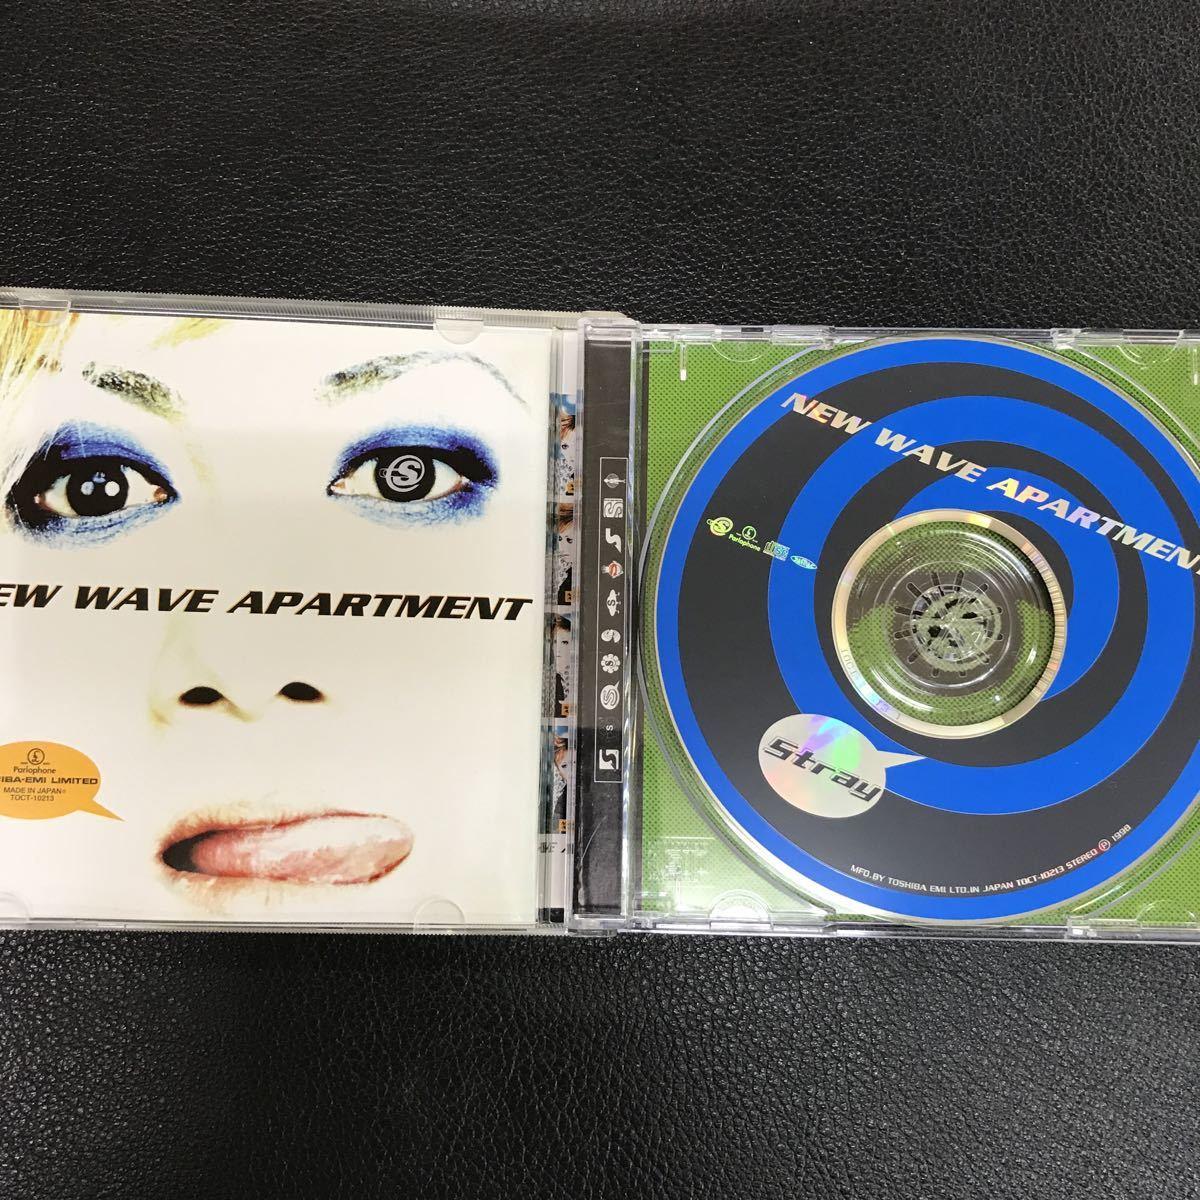 CD 中古☆【邦楽】ストレイ ニューウェーヴ アパートメント